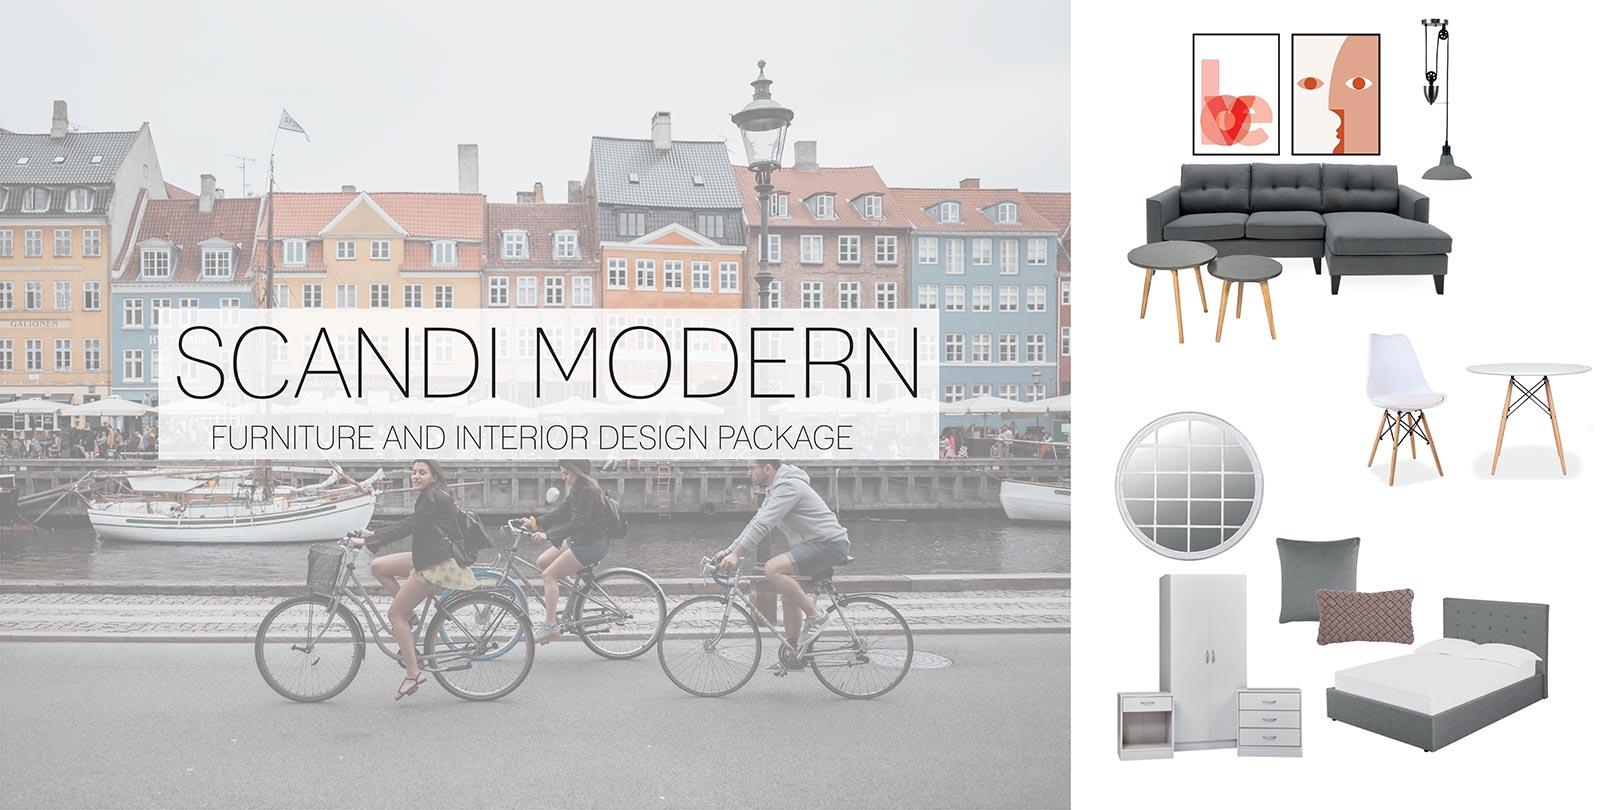 Scandi Modern Furniture Design Package